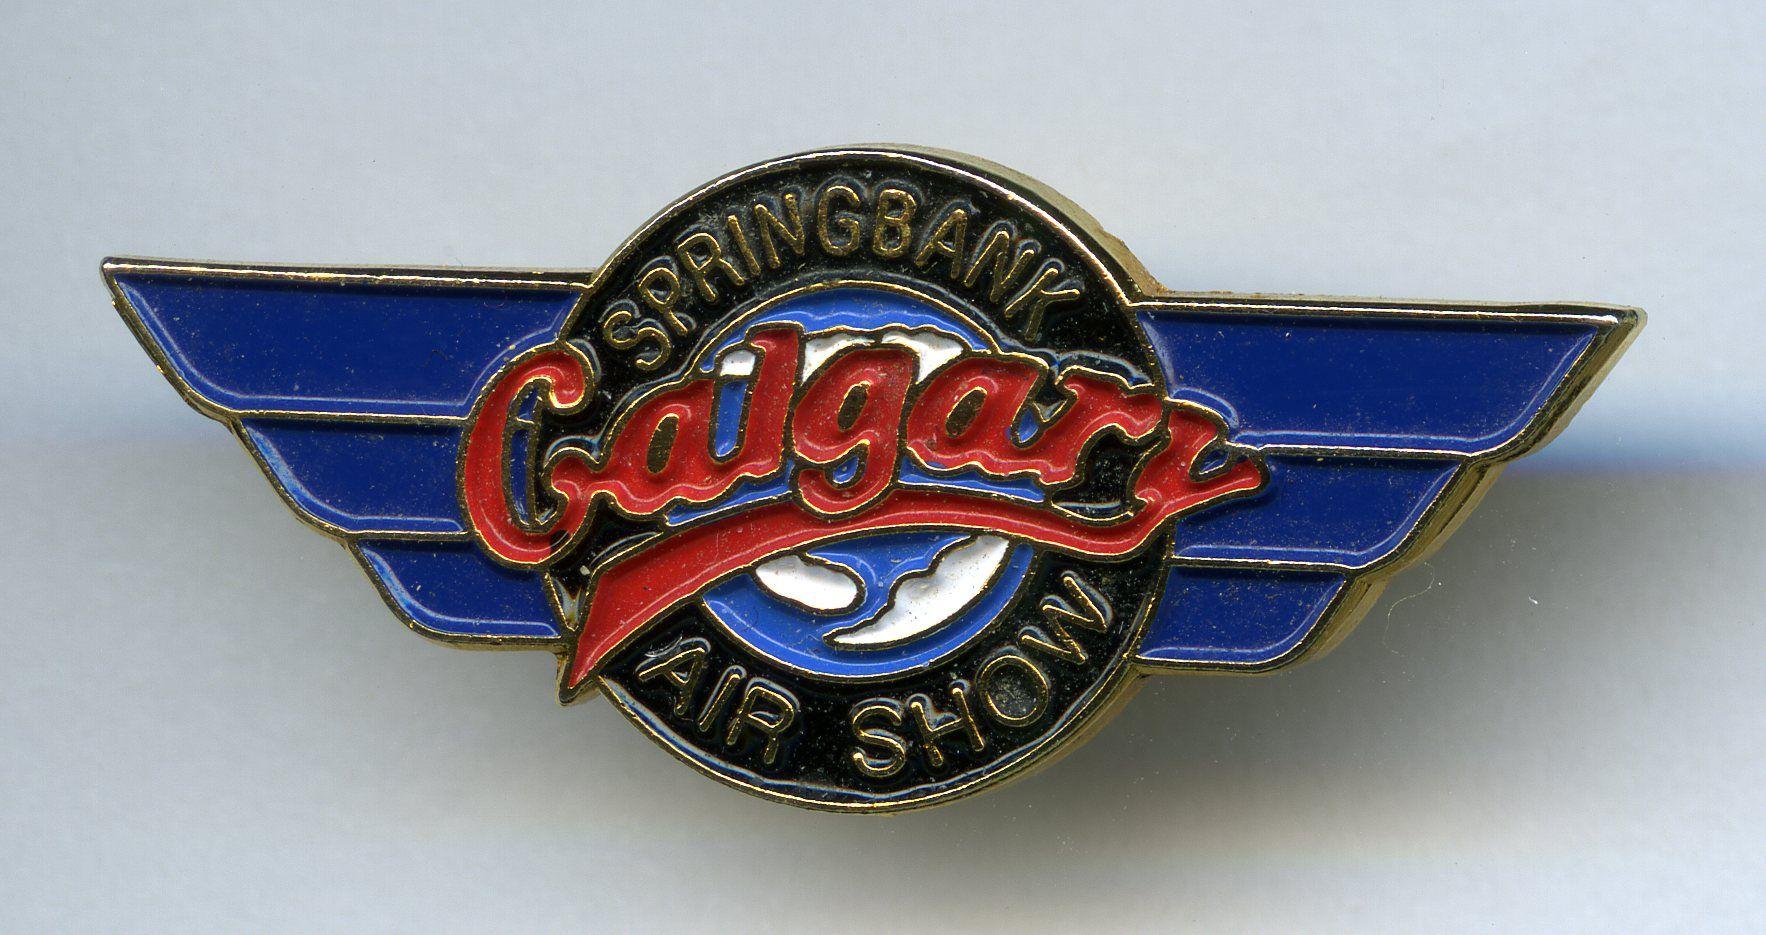 Springbank Air Show, Calgary, Alberta Air show